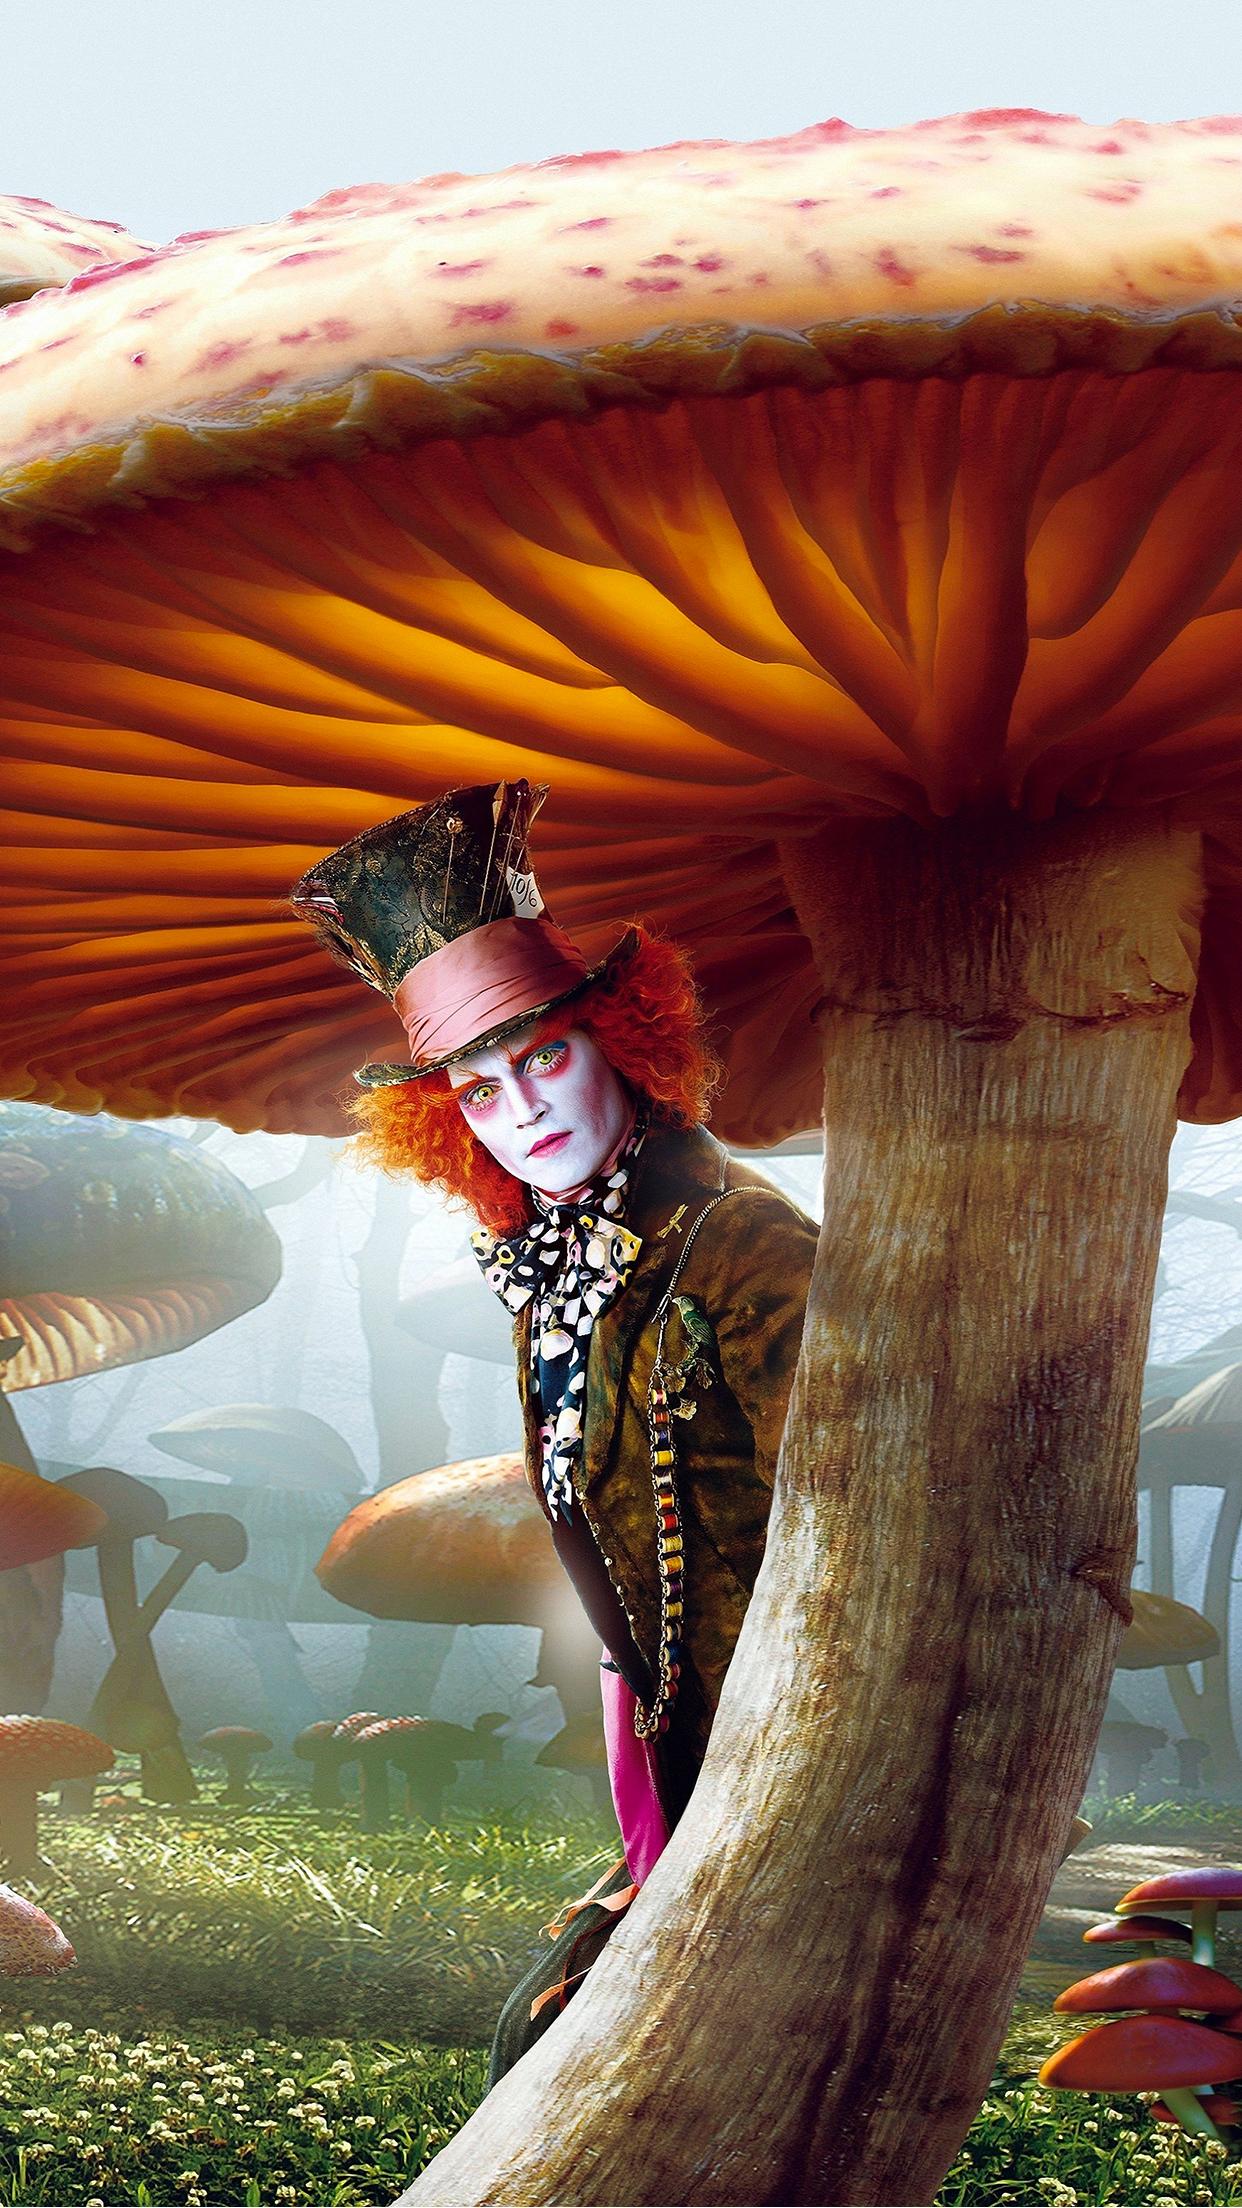 Alice in Wonderland depp mad hatter 3Wallpapers iPhone Parallax Alice in Wonderland depp mad hatter